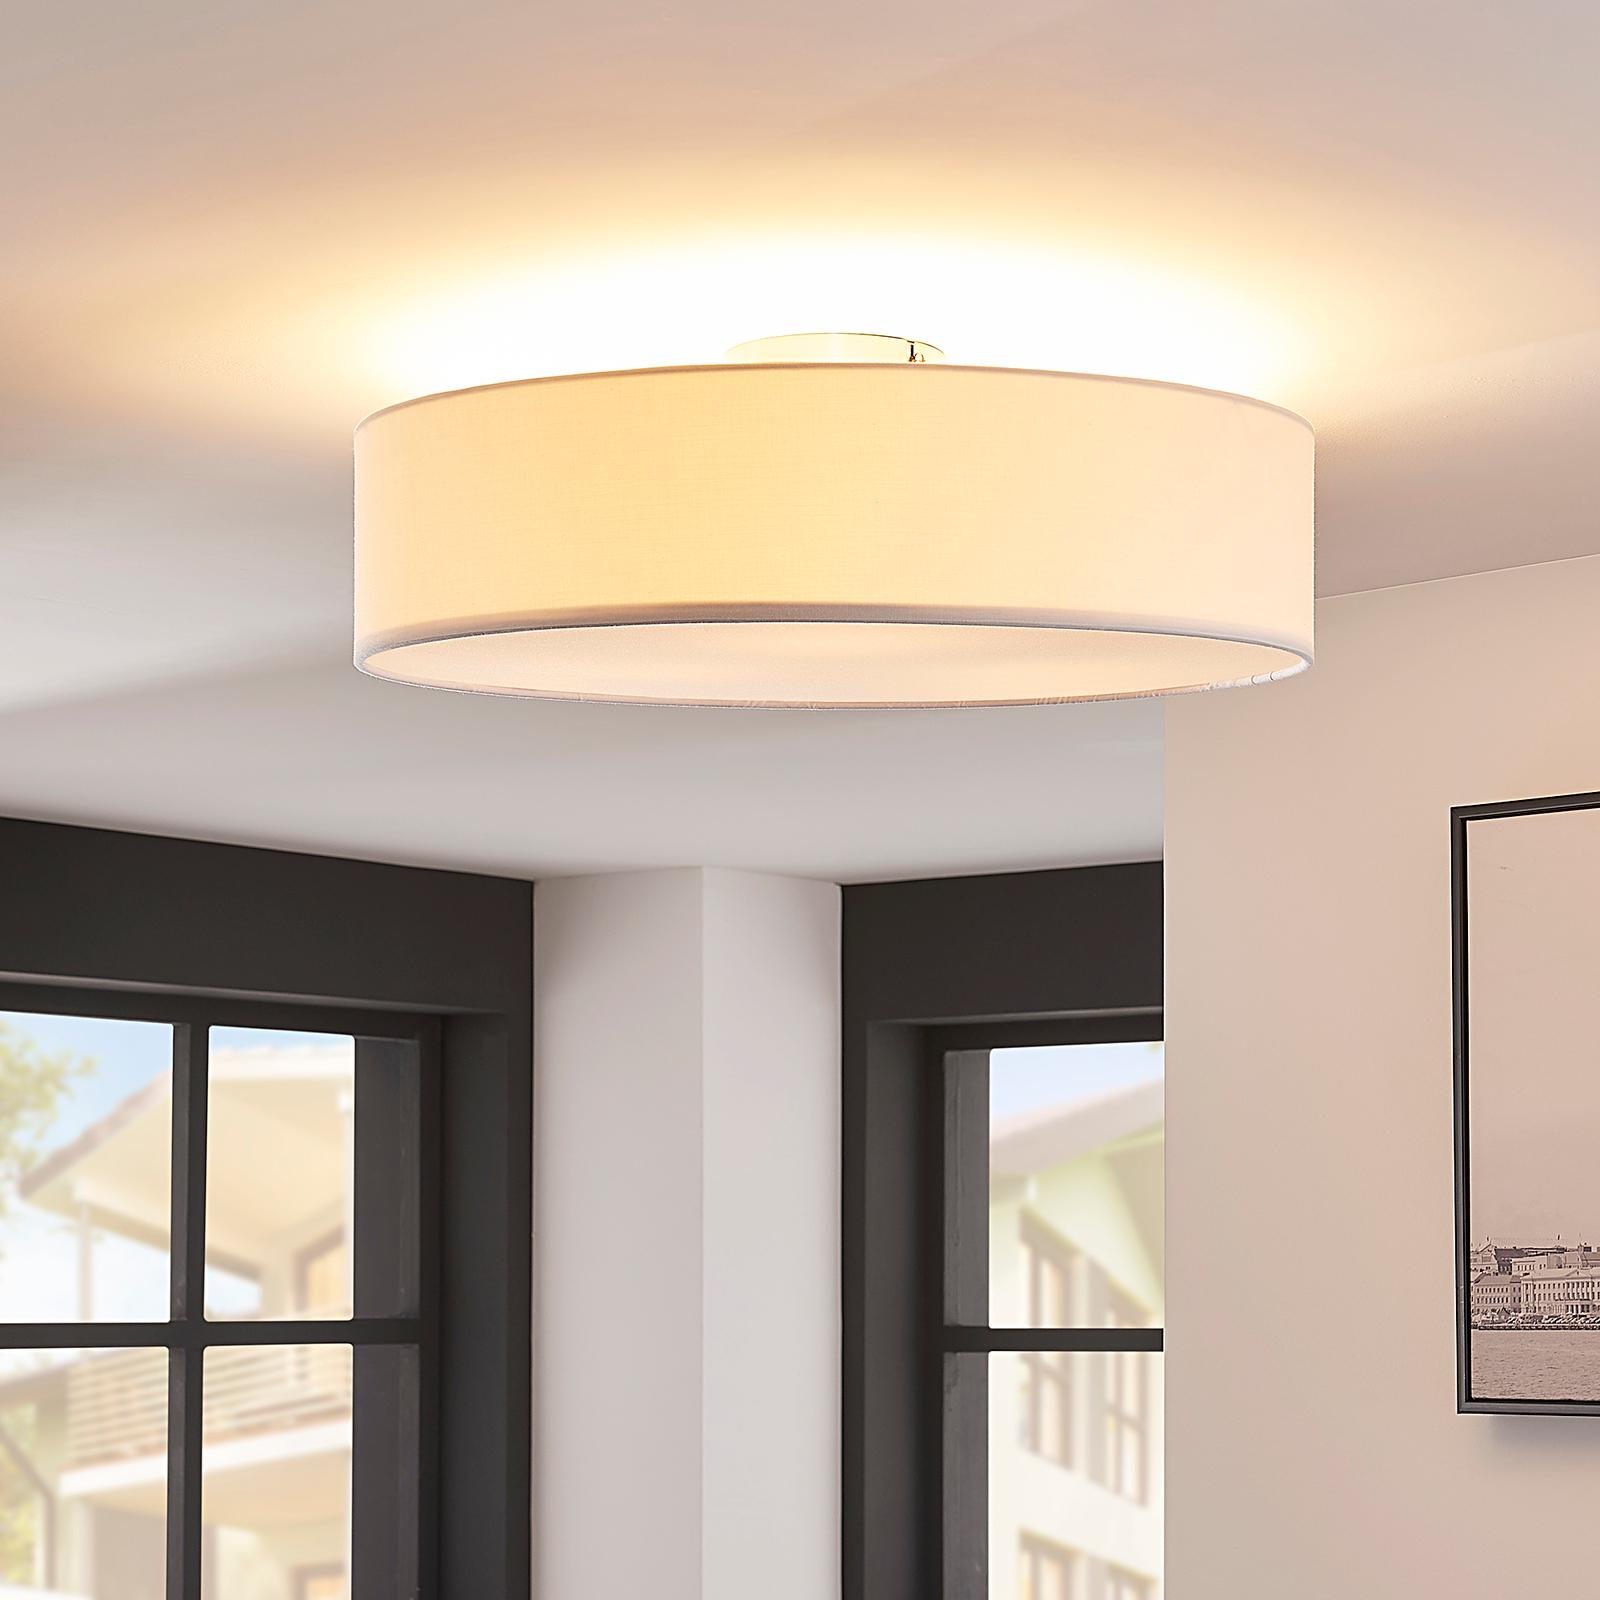 Vit LED-taklampa Sebatin av tyg